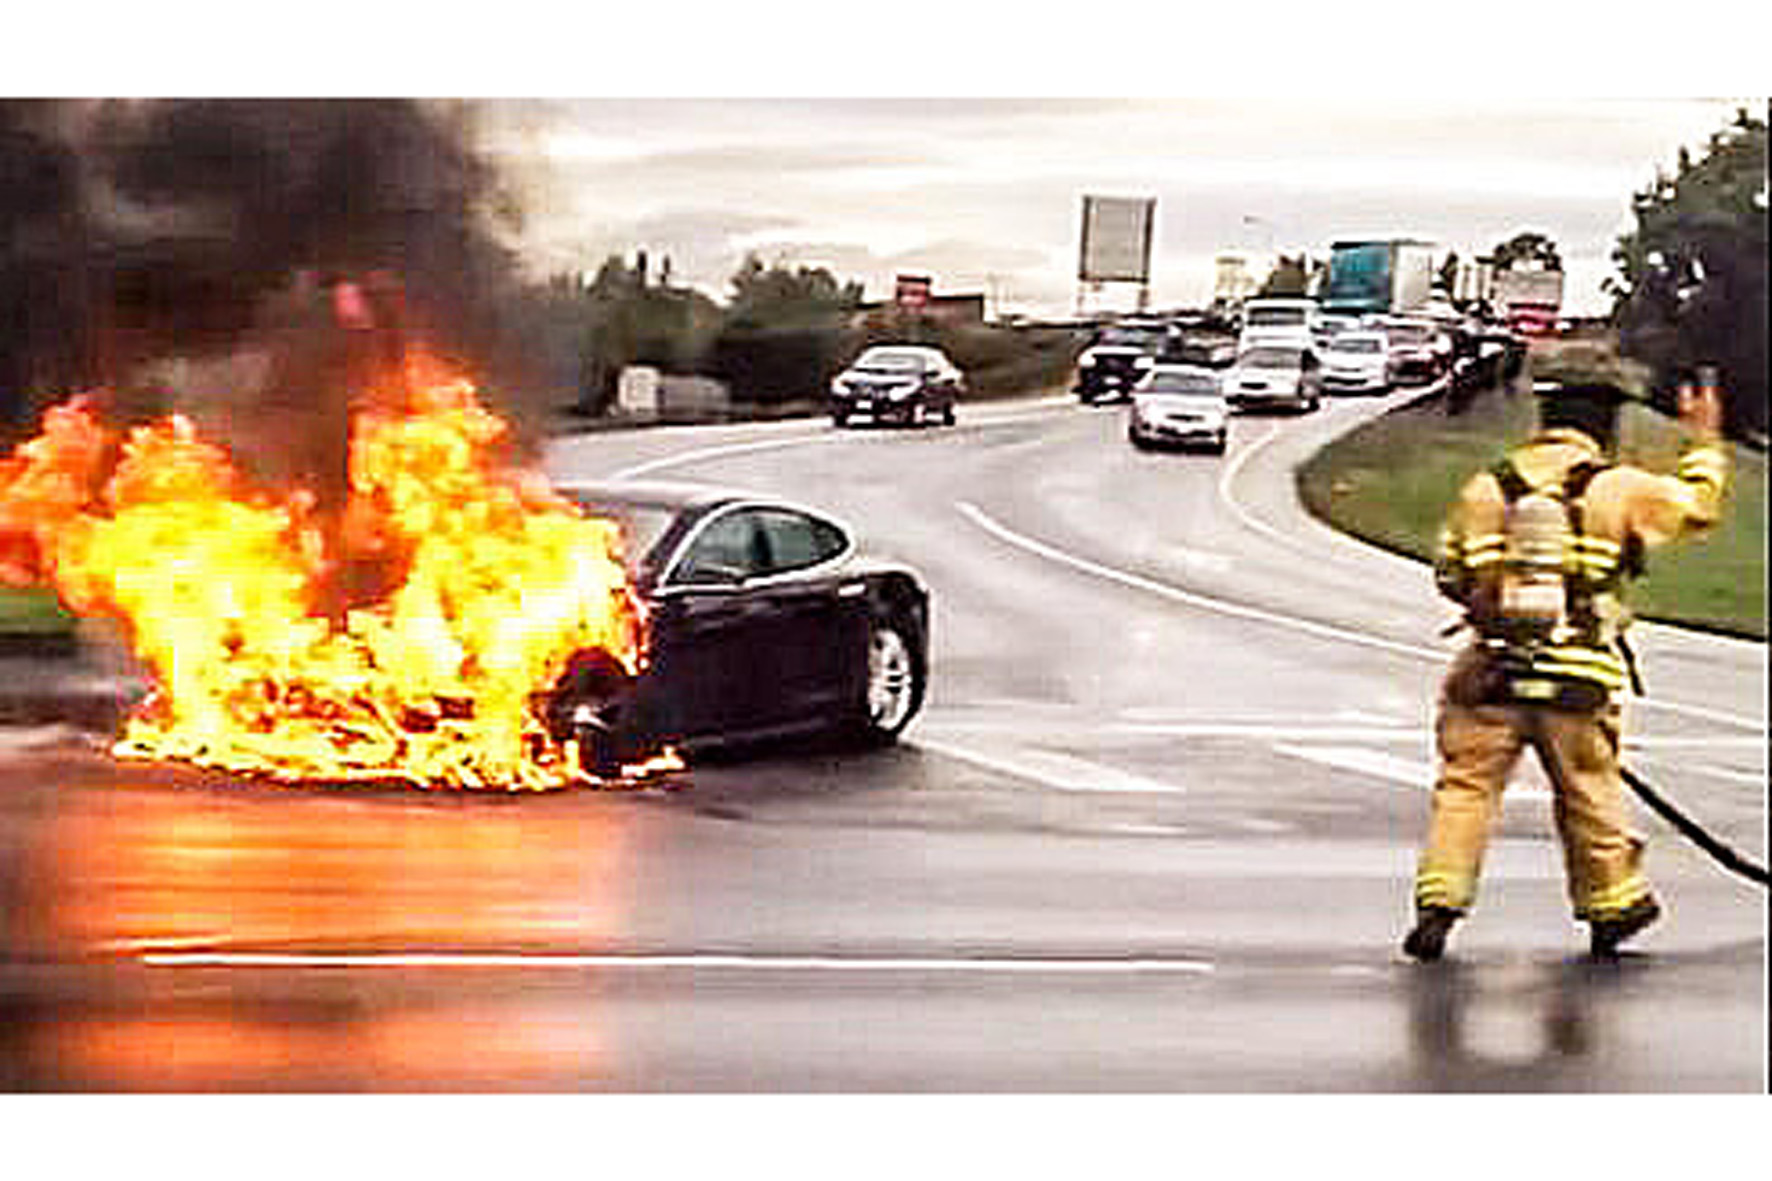 Autobrand: Der Tesla Modell S Brand in Amerika